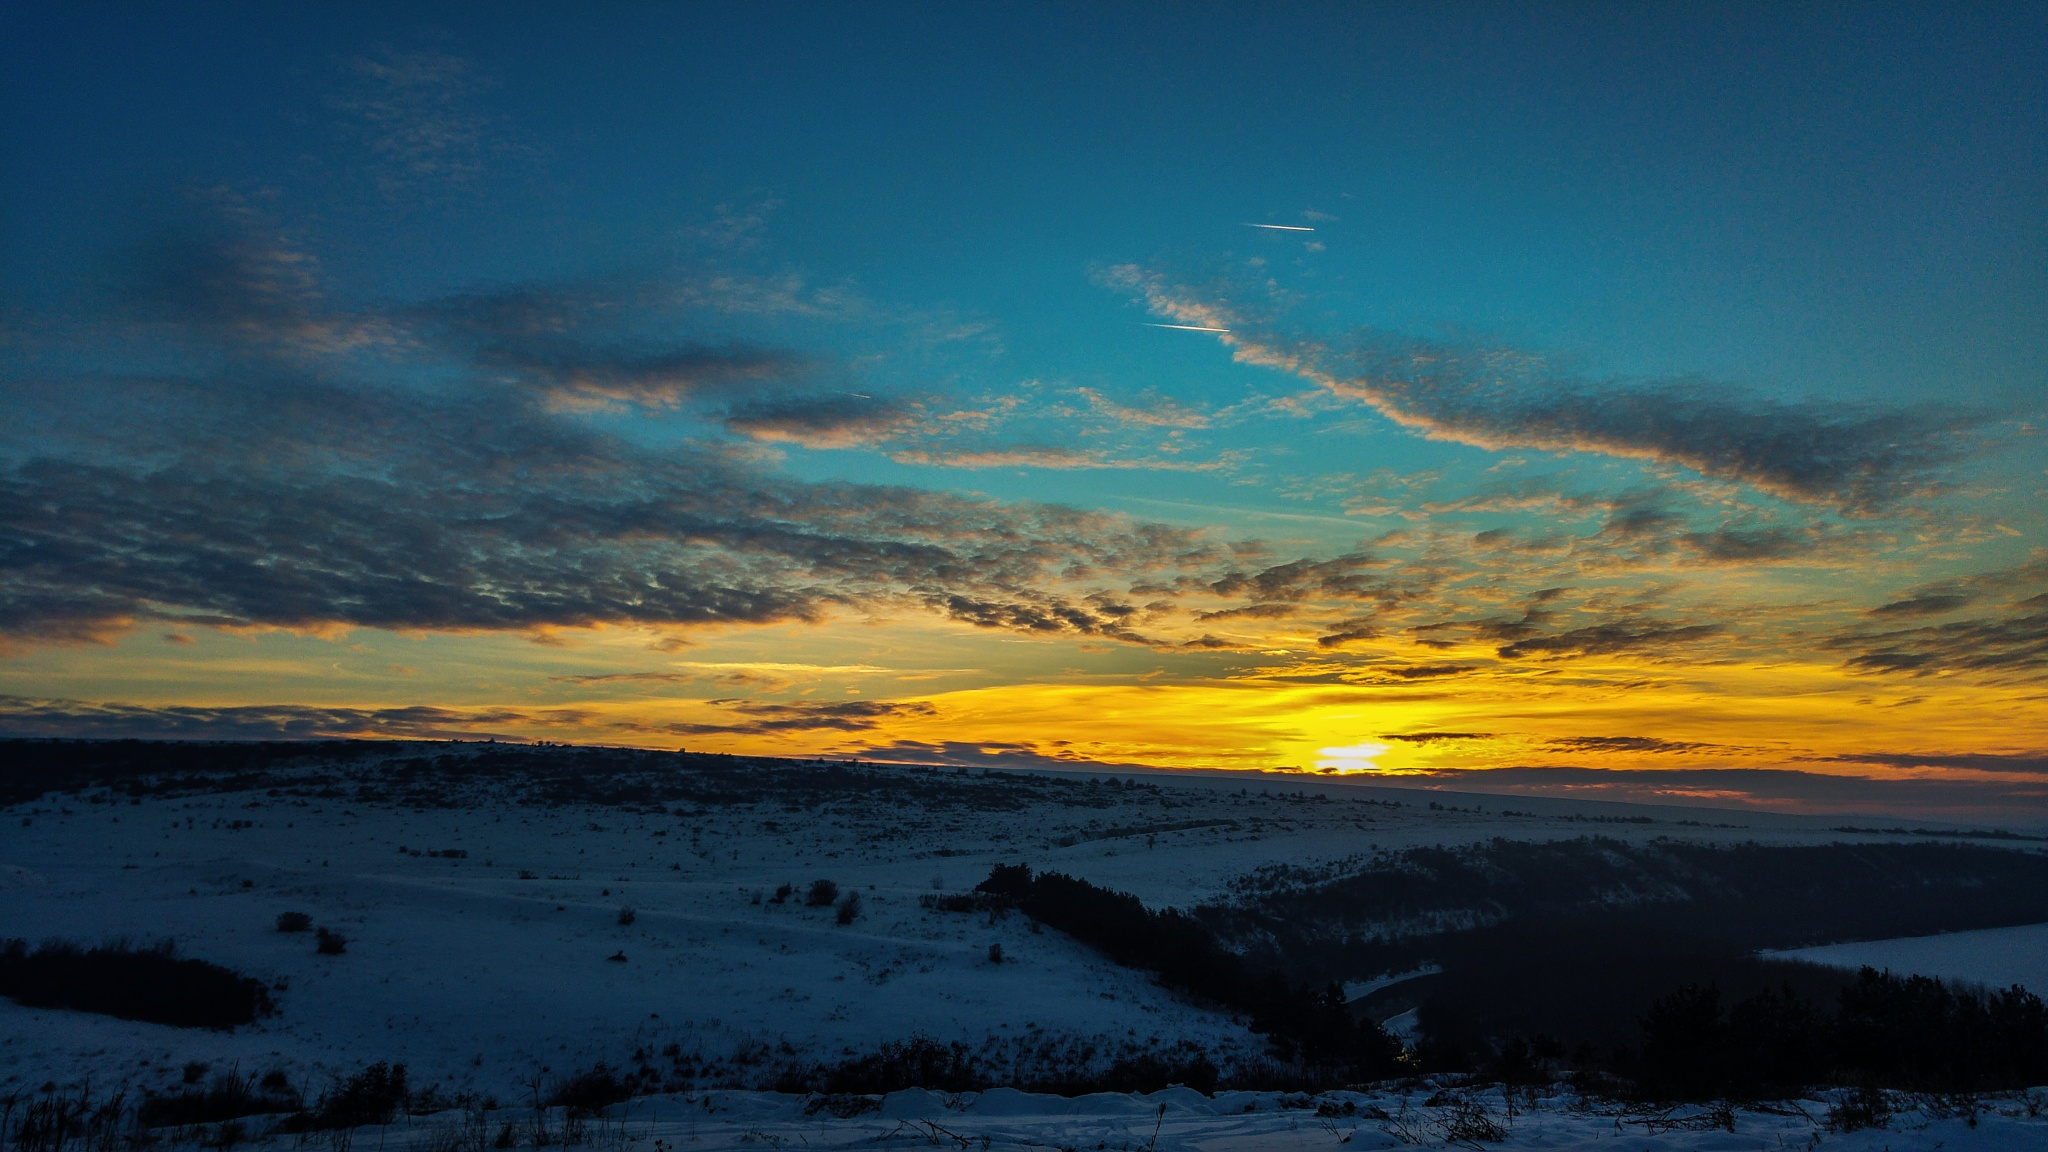 Sunset by Tsvetan Ganev-CECLII